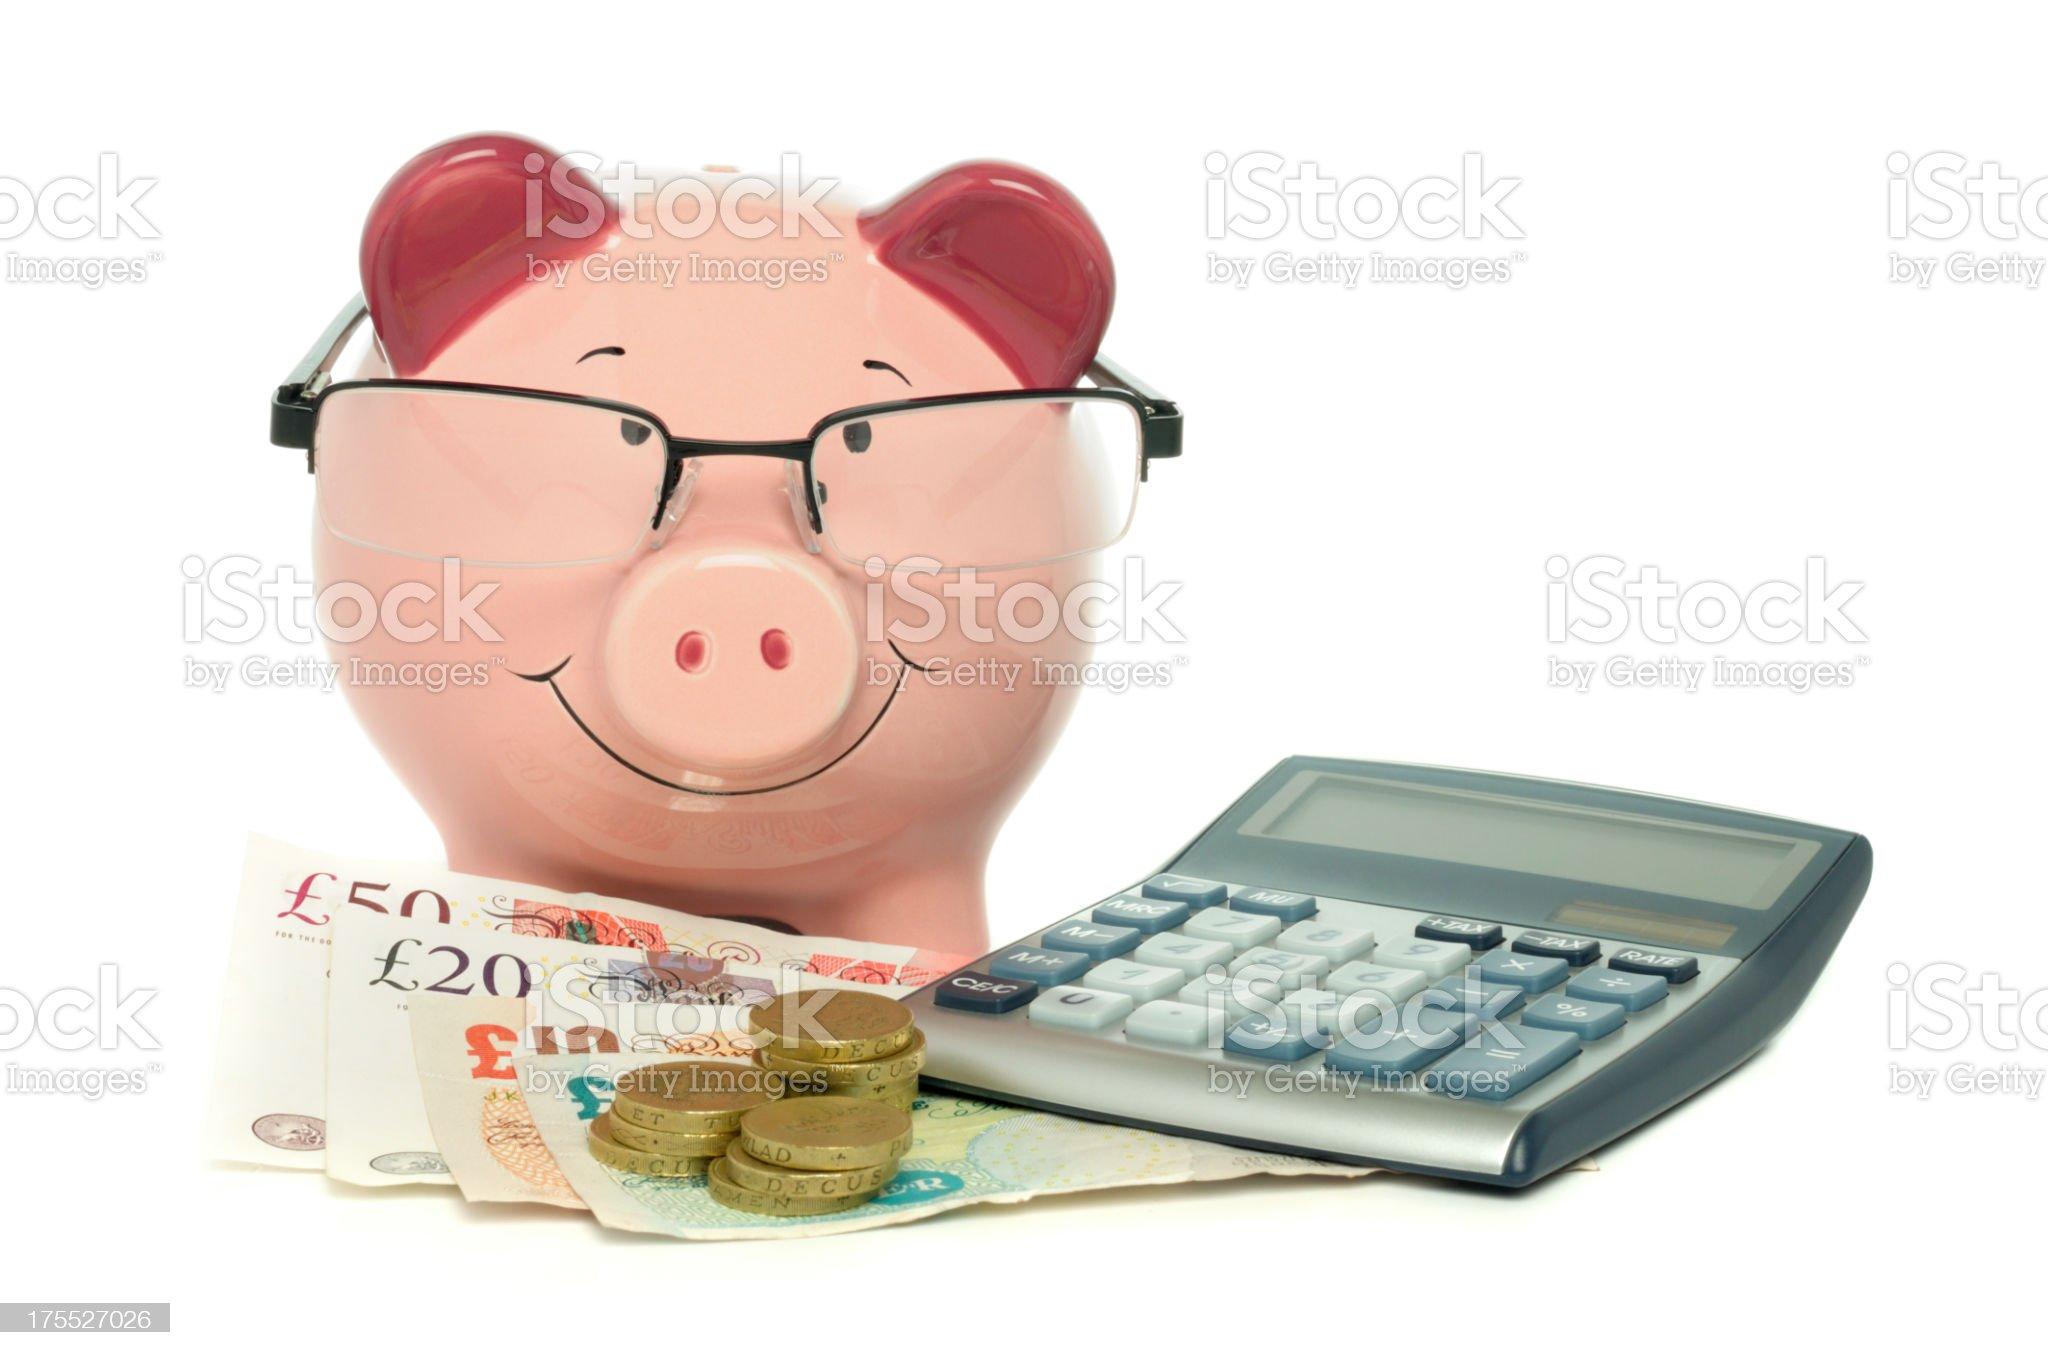 Calculating savings royalty-free stock photo